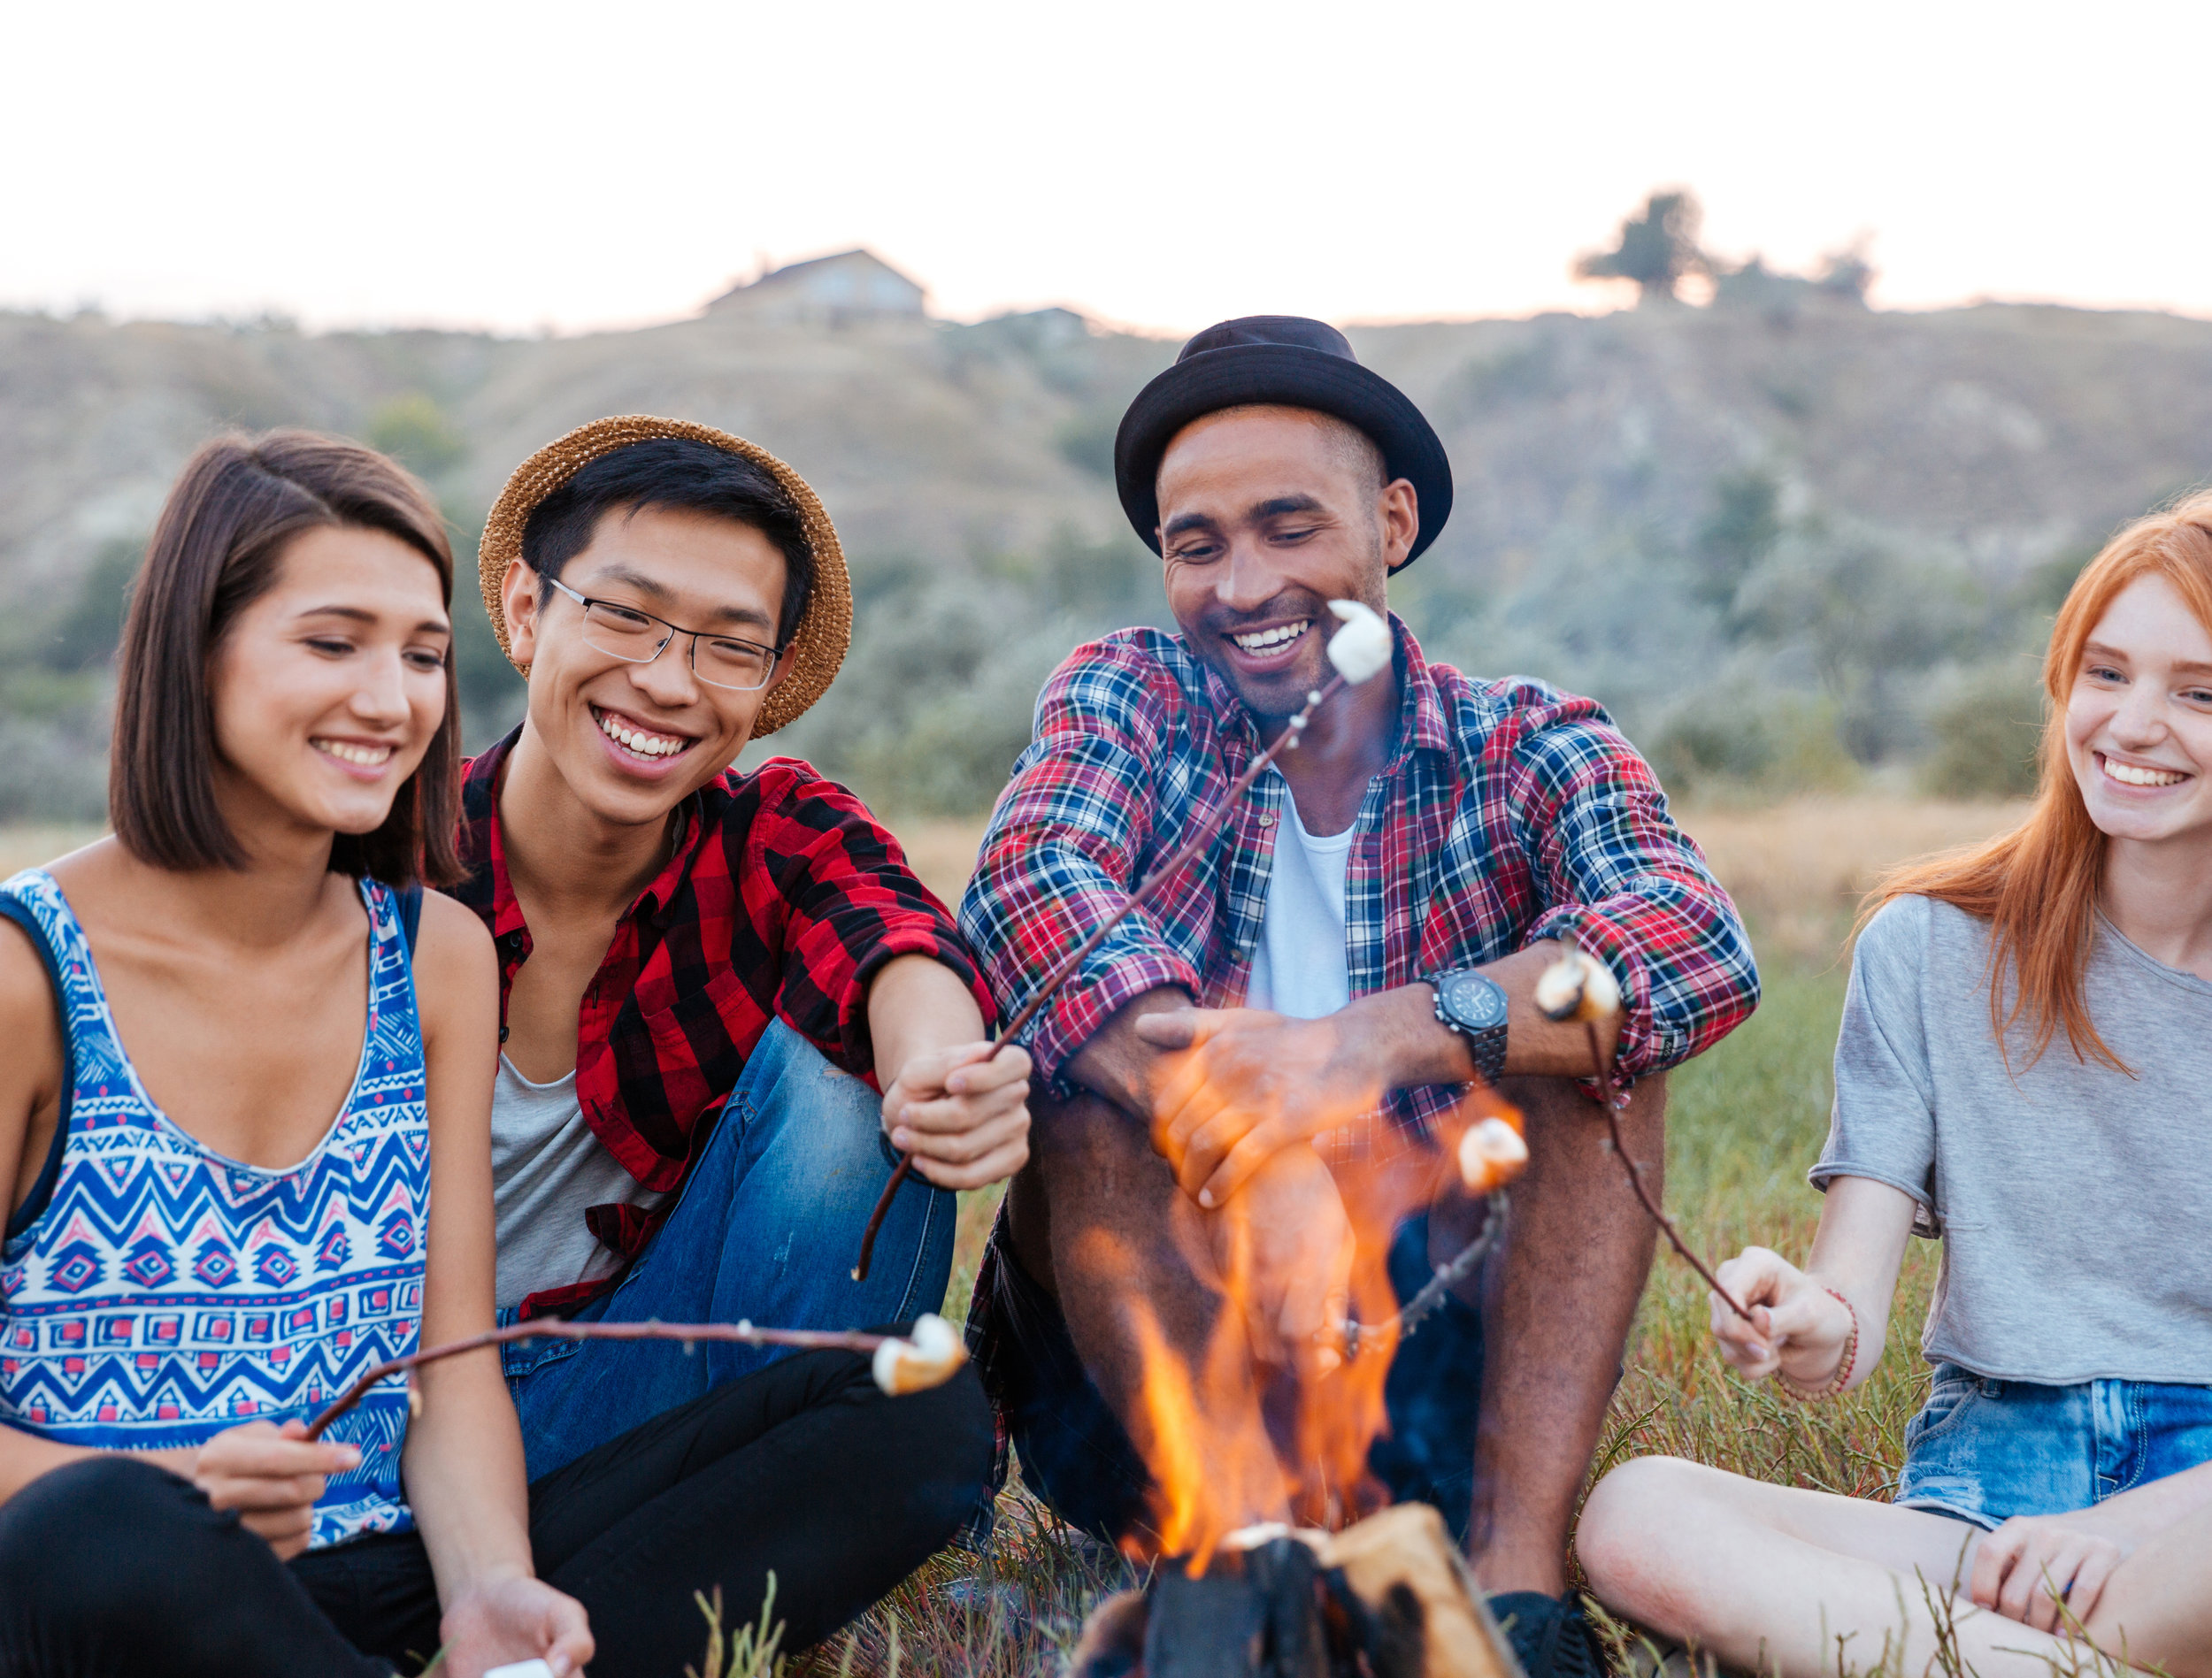 Toasting Marshmallows around a campfire